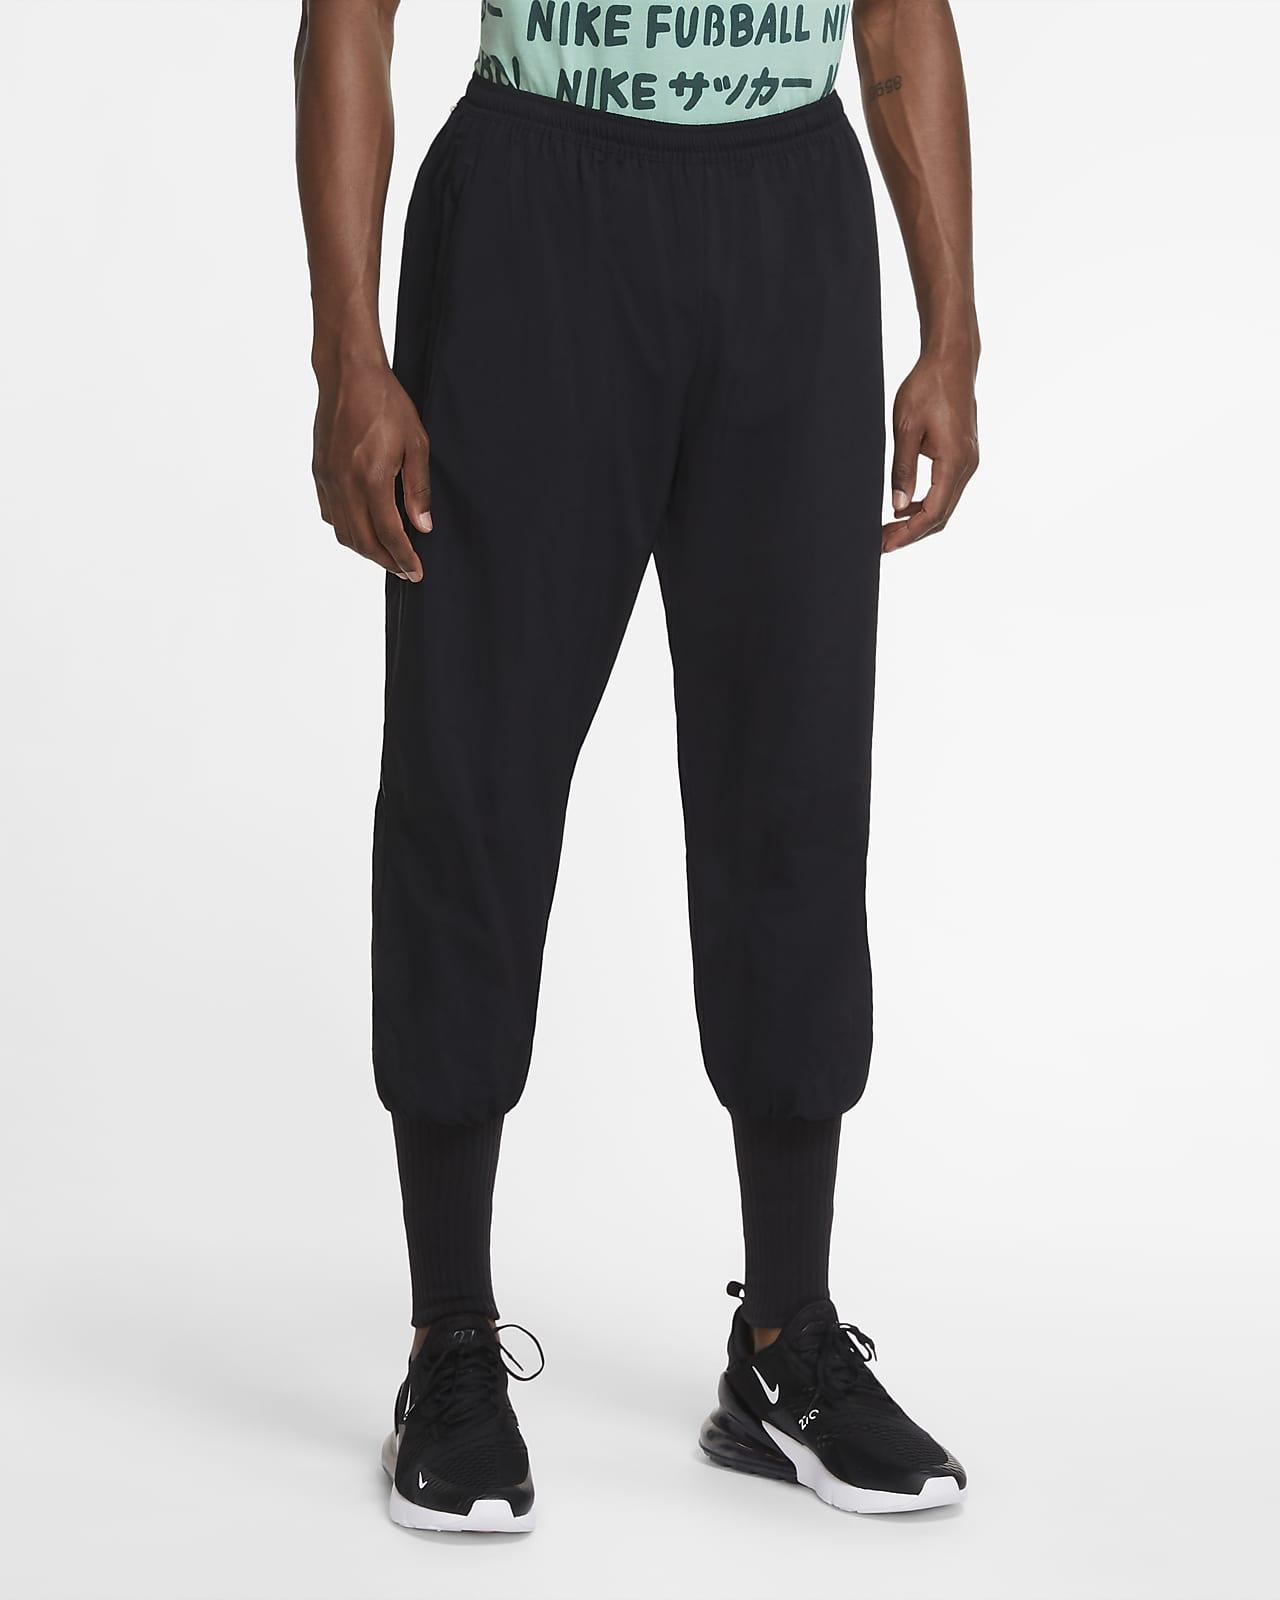 Nike F.C. Men's Woven Soccer Pants